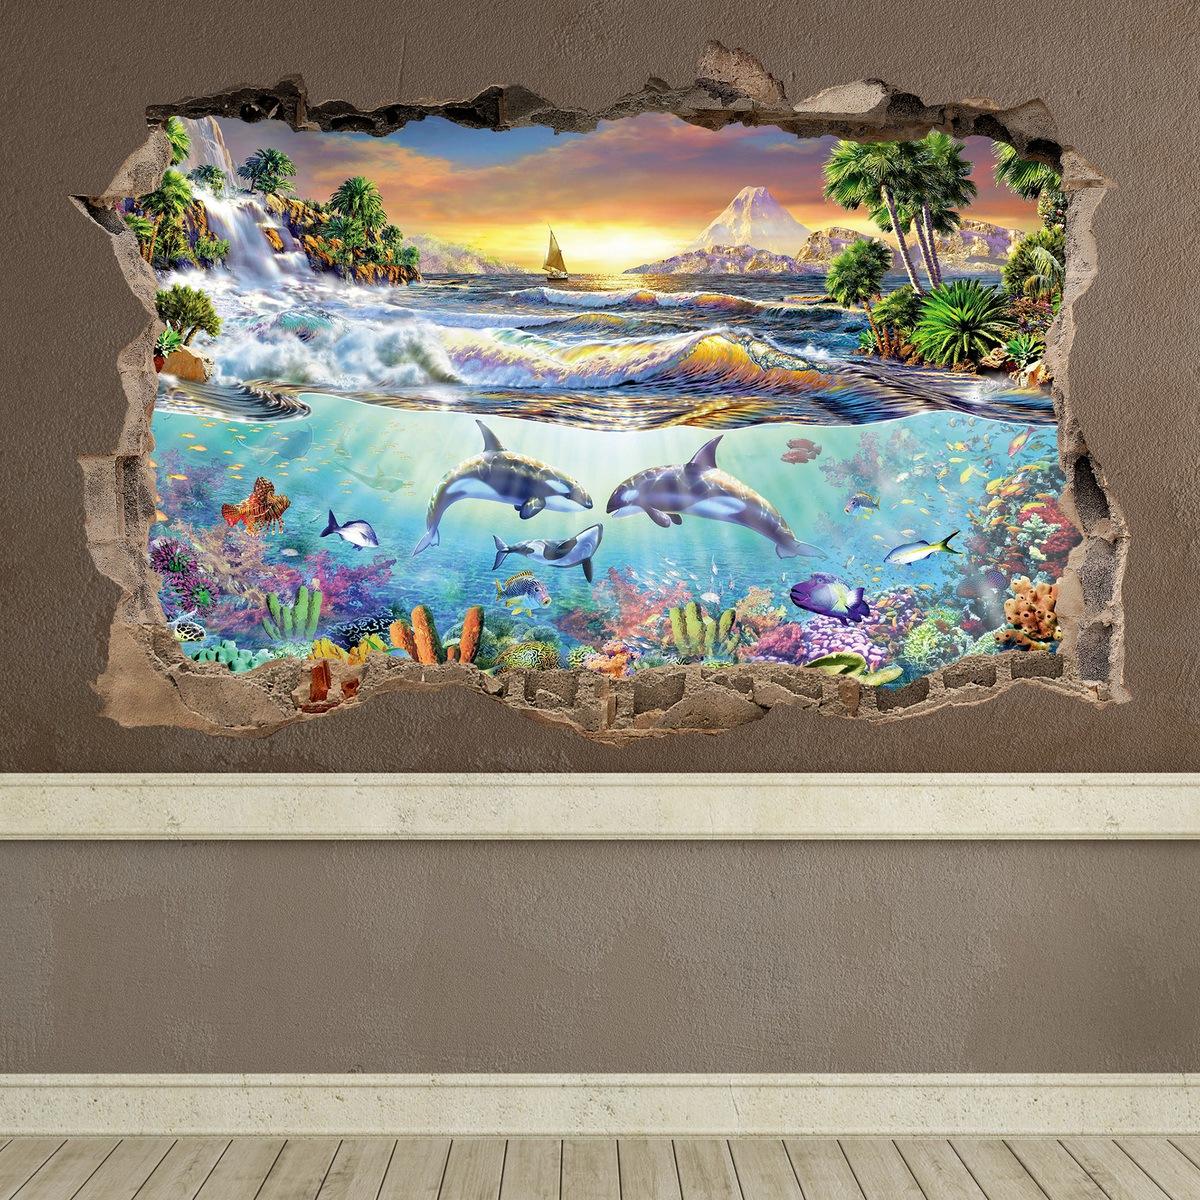 Compra vinilos con vistas a paisajes marinos teleadhesivo for Vinilos murales paisajes